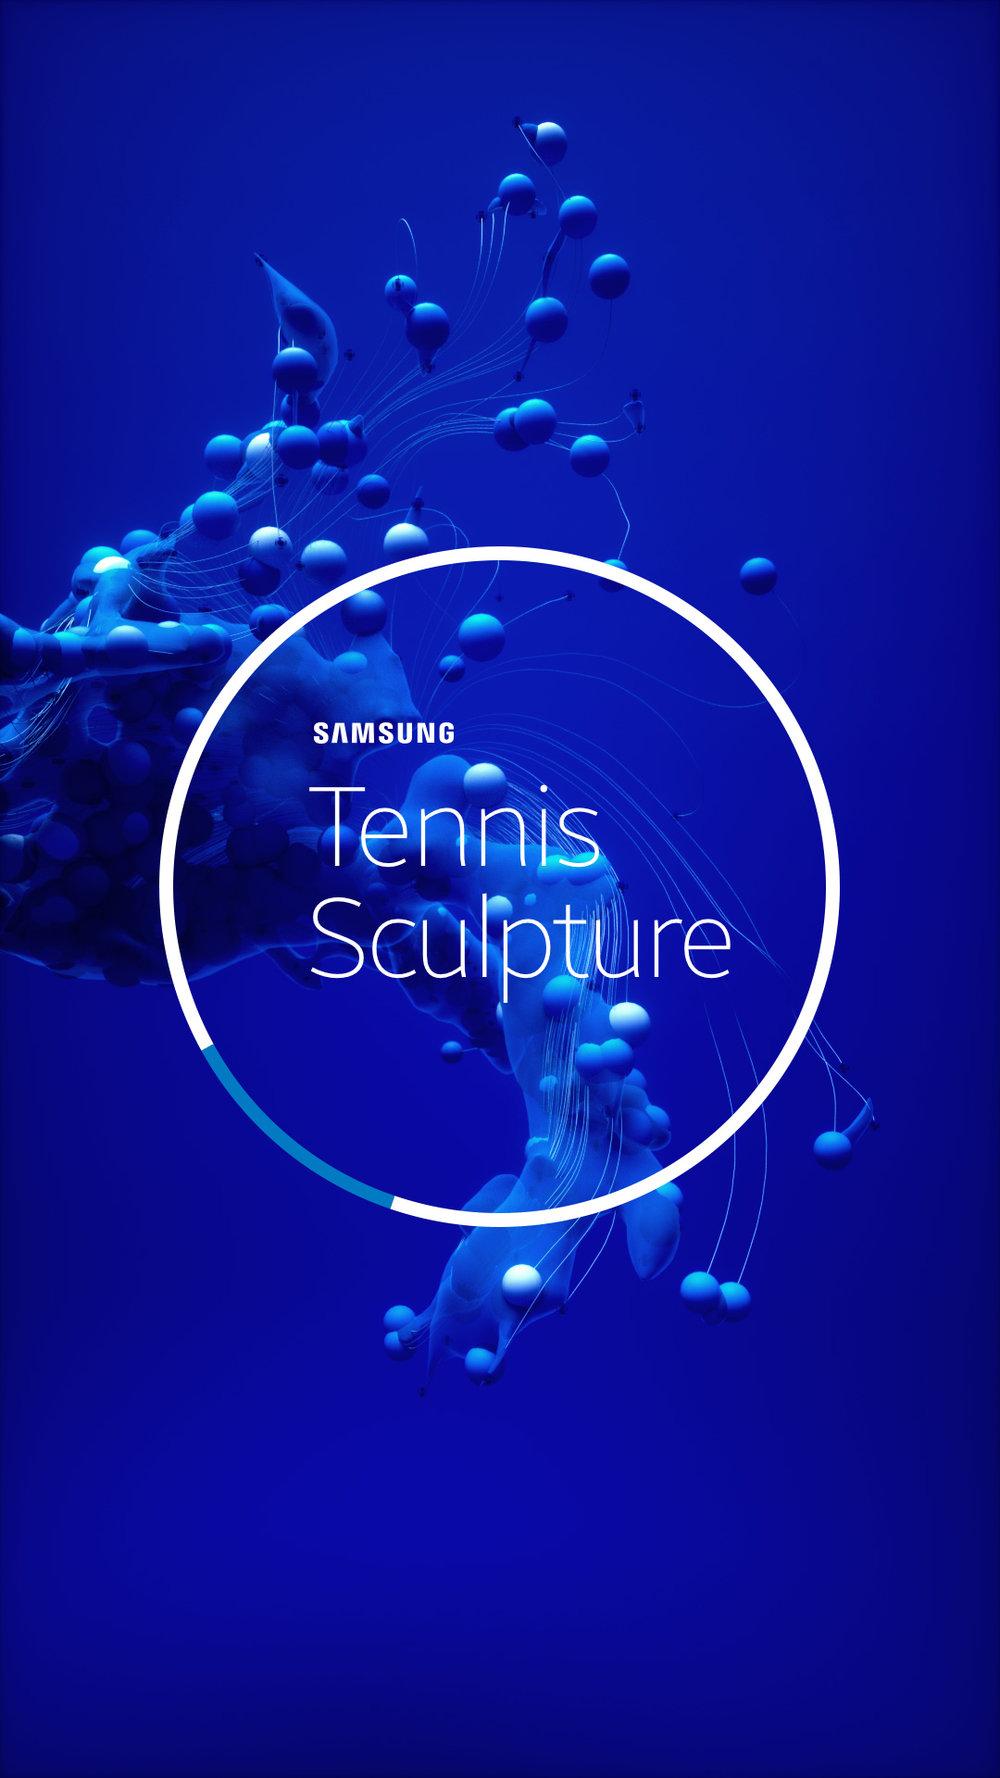 RED17_01_Samsung_Fitness_Tennis_C_SF01_v001.jpg